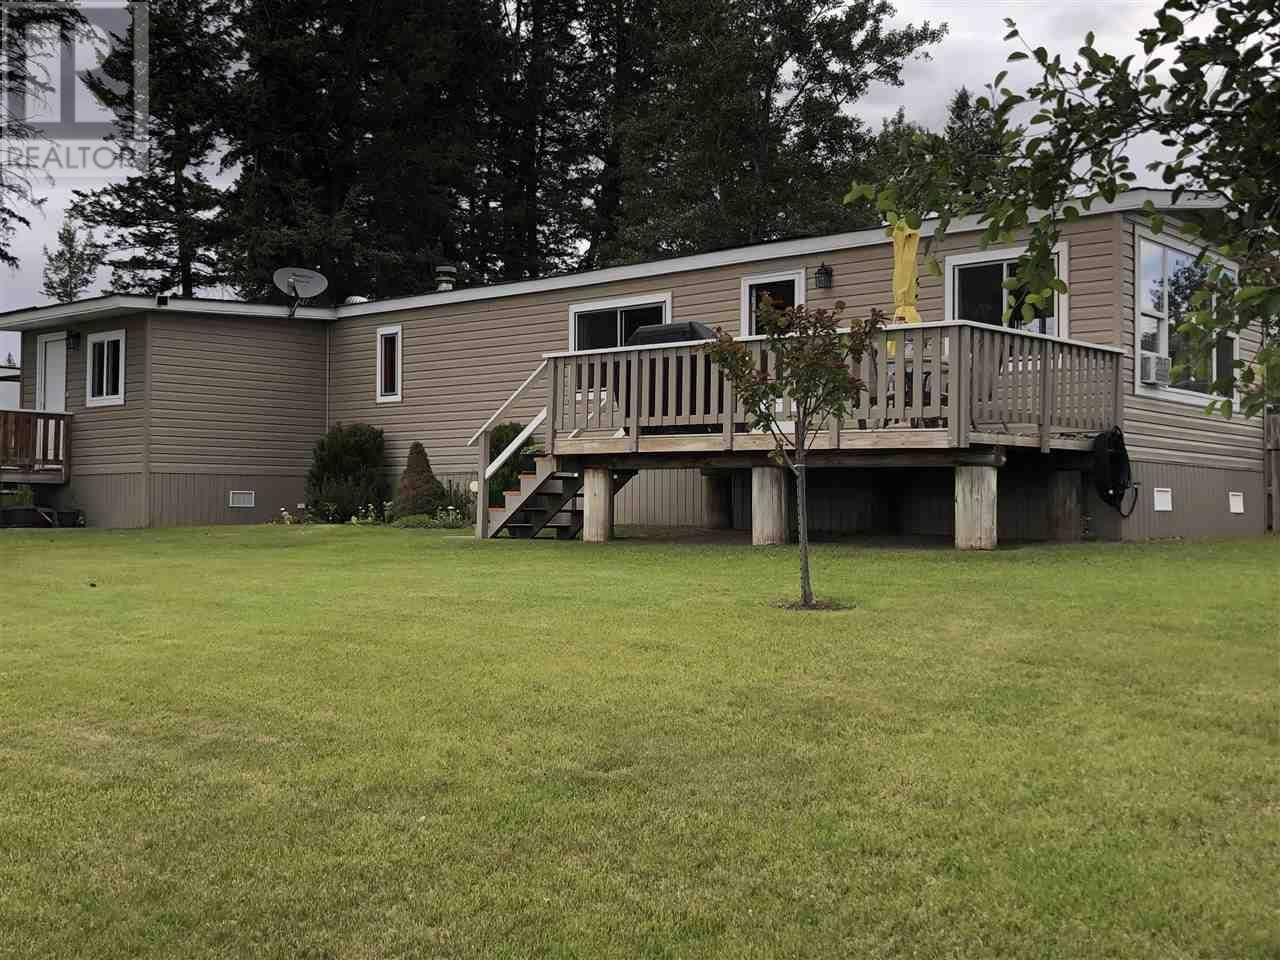 Home for sale at 4813 Clarke Ave Lac La Hache British Columbia - MLS: R2443905